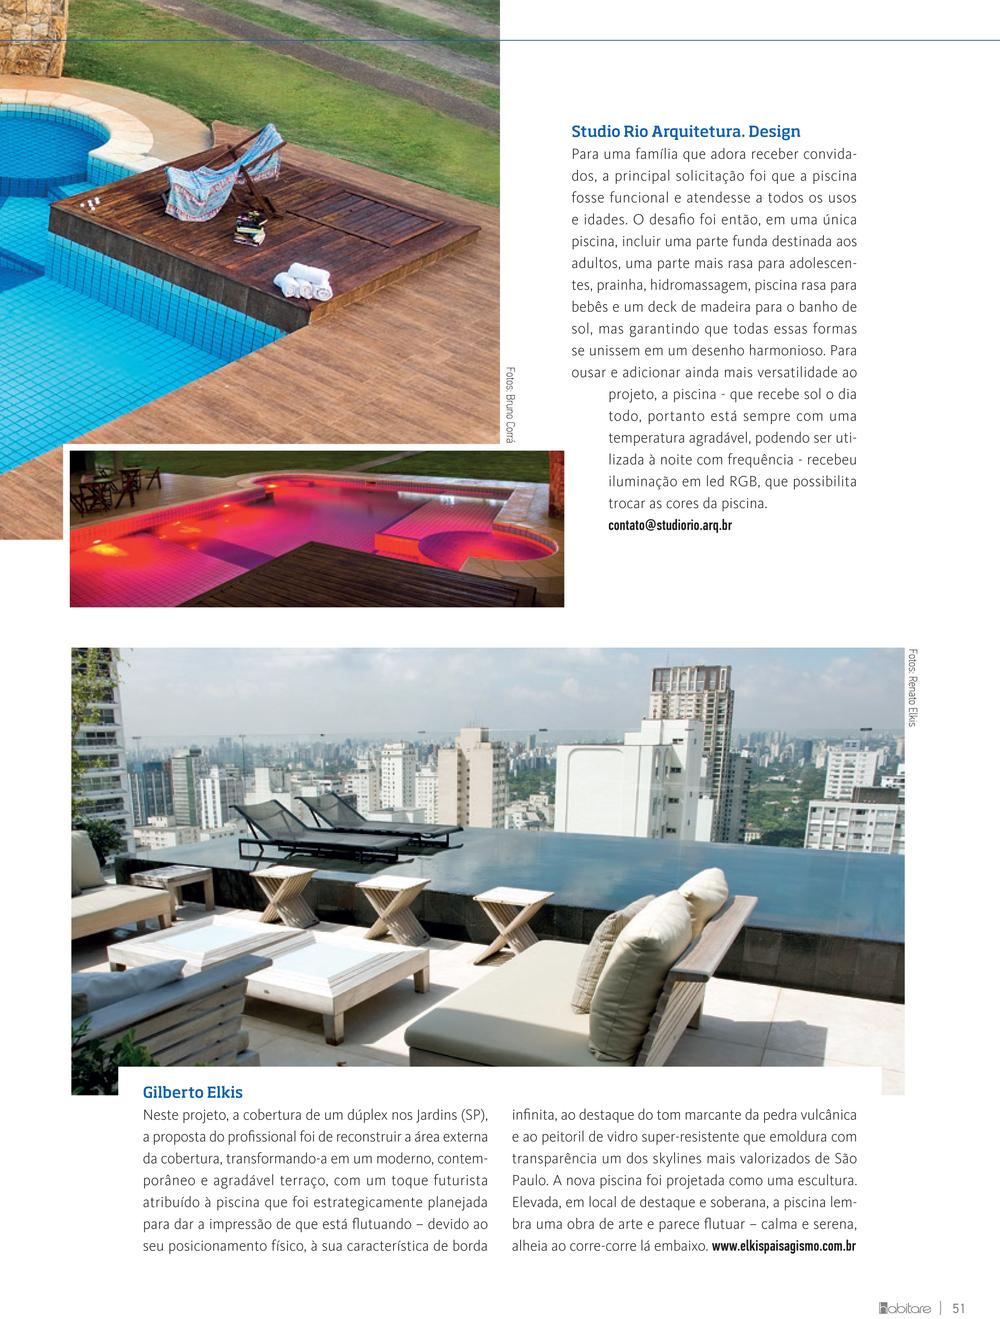 03 MARÇO ABRIL 2015_revista habitare ed 51 (4).jpg